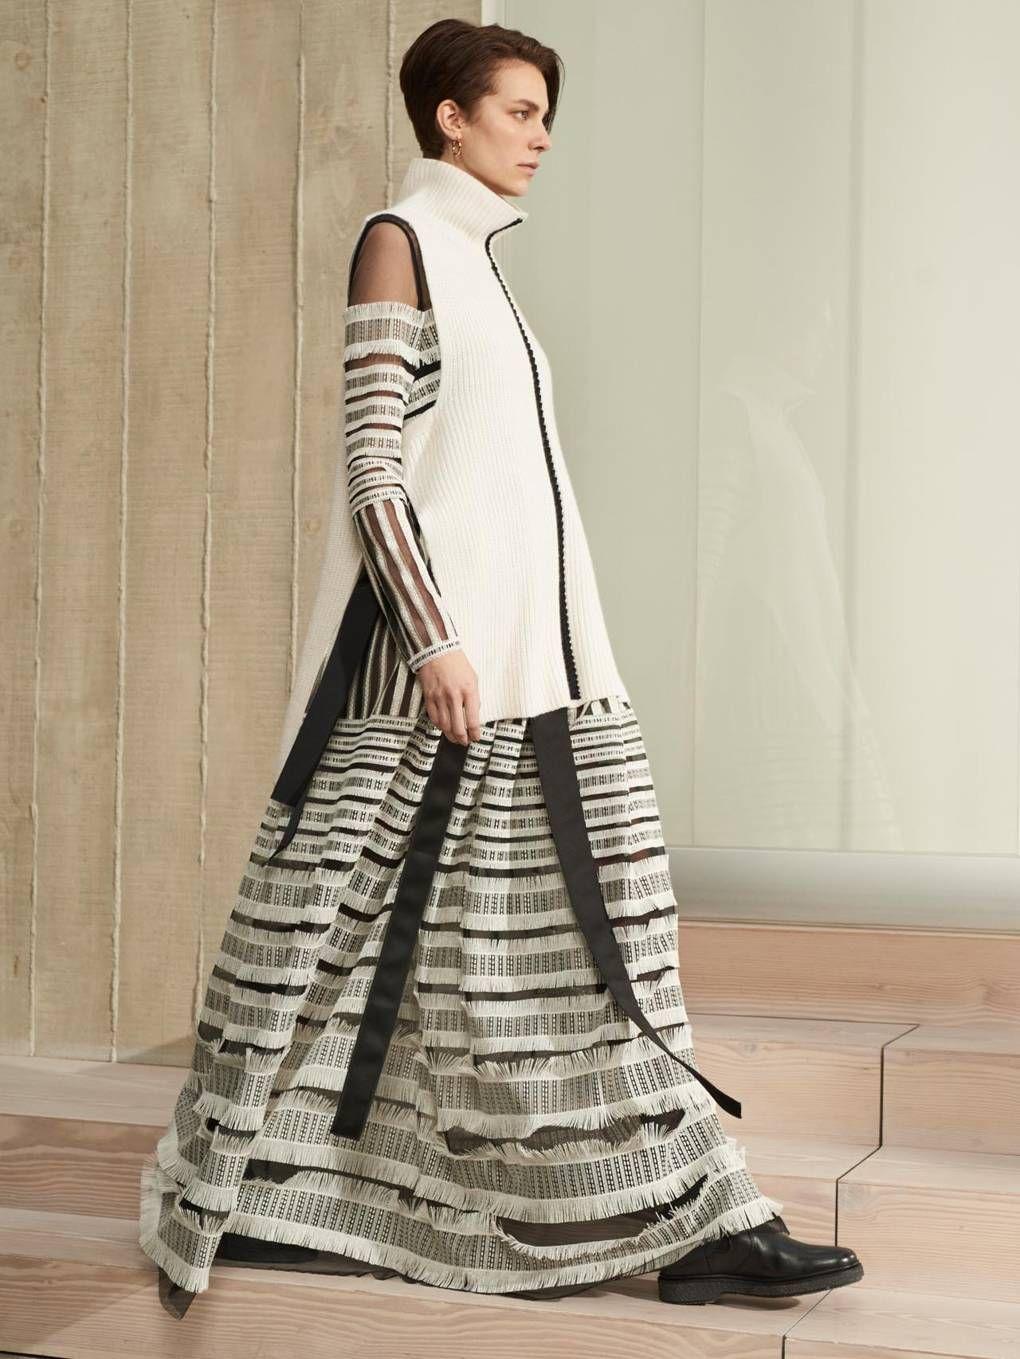 Amanda Wakeley Fall 12 Ready to Wear Fashion Show   Fashion ...